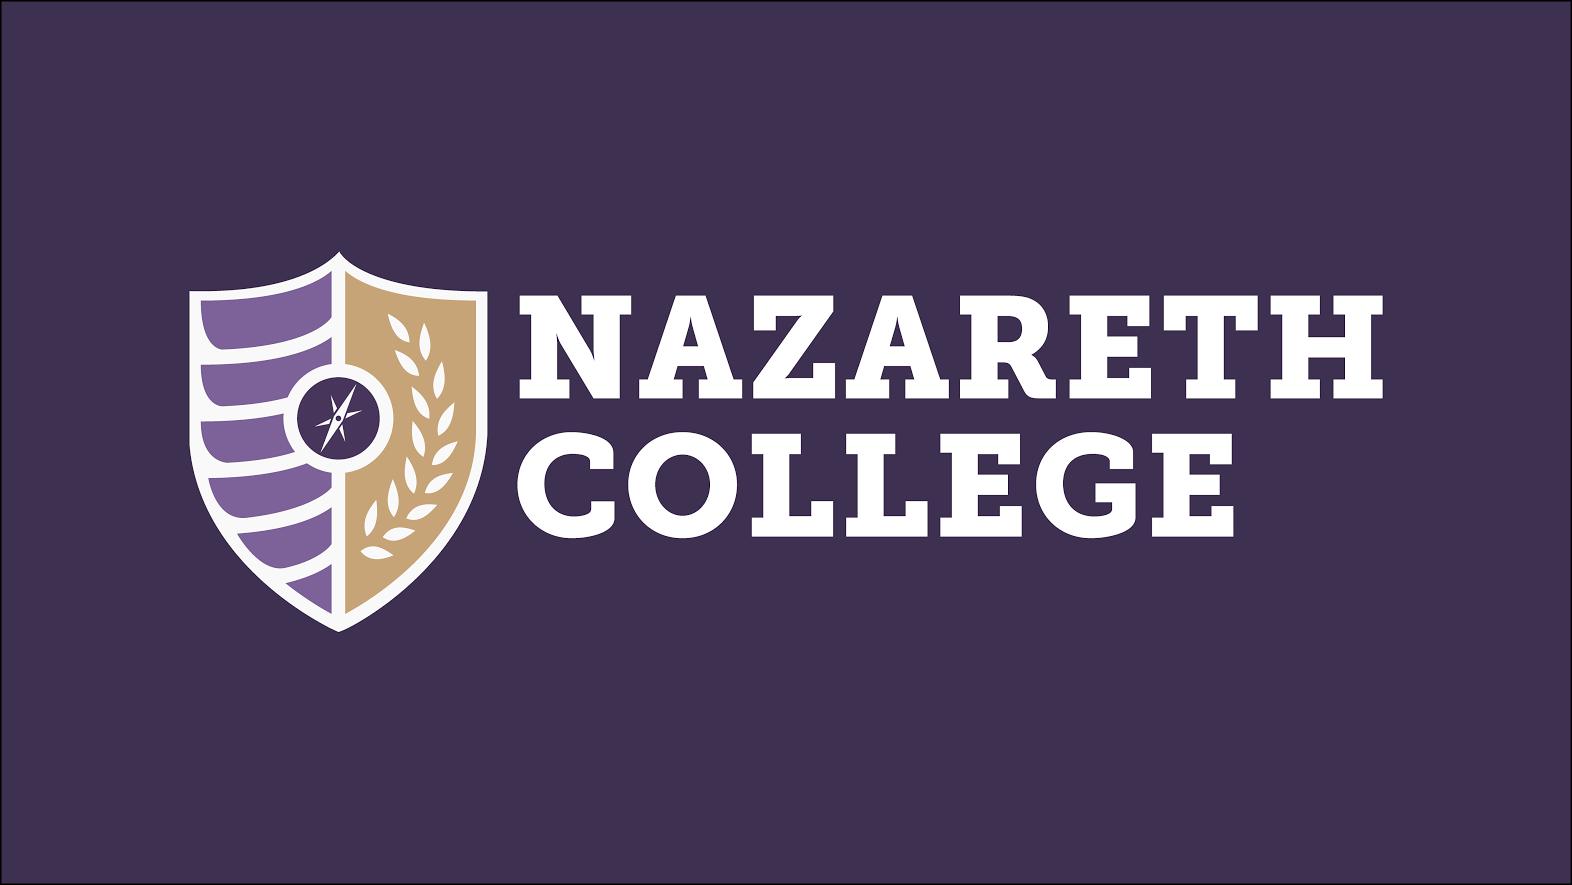 Nazareth commencement screen